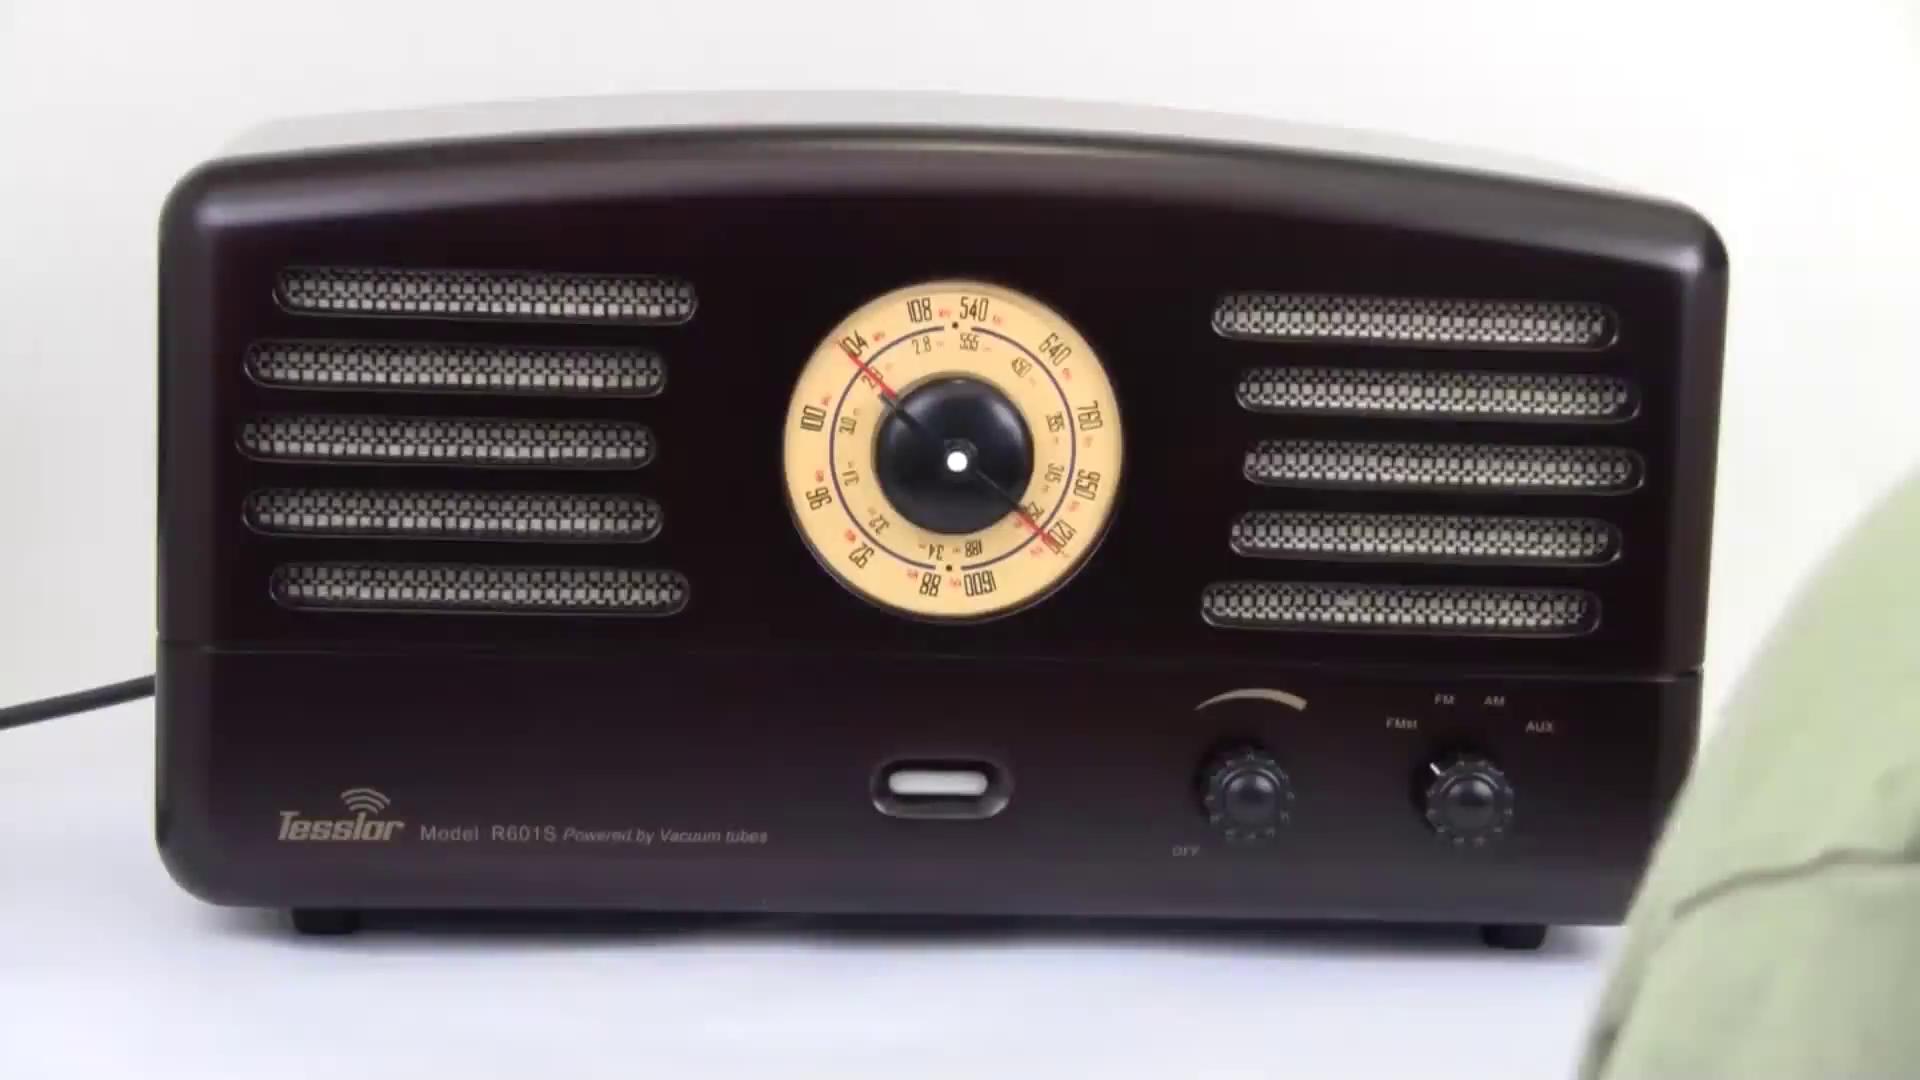 Großartig Pyle Radio Schaltplan Fotos - Schaltplan Serie Circuit ...